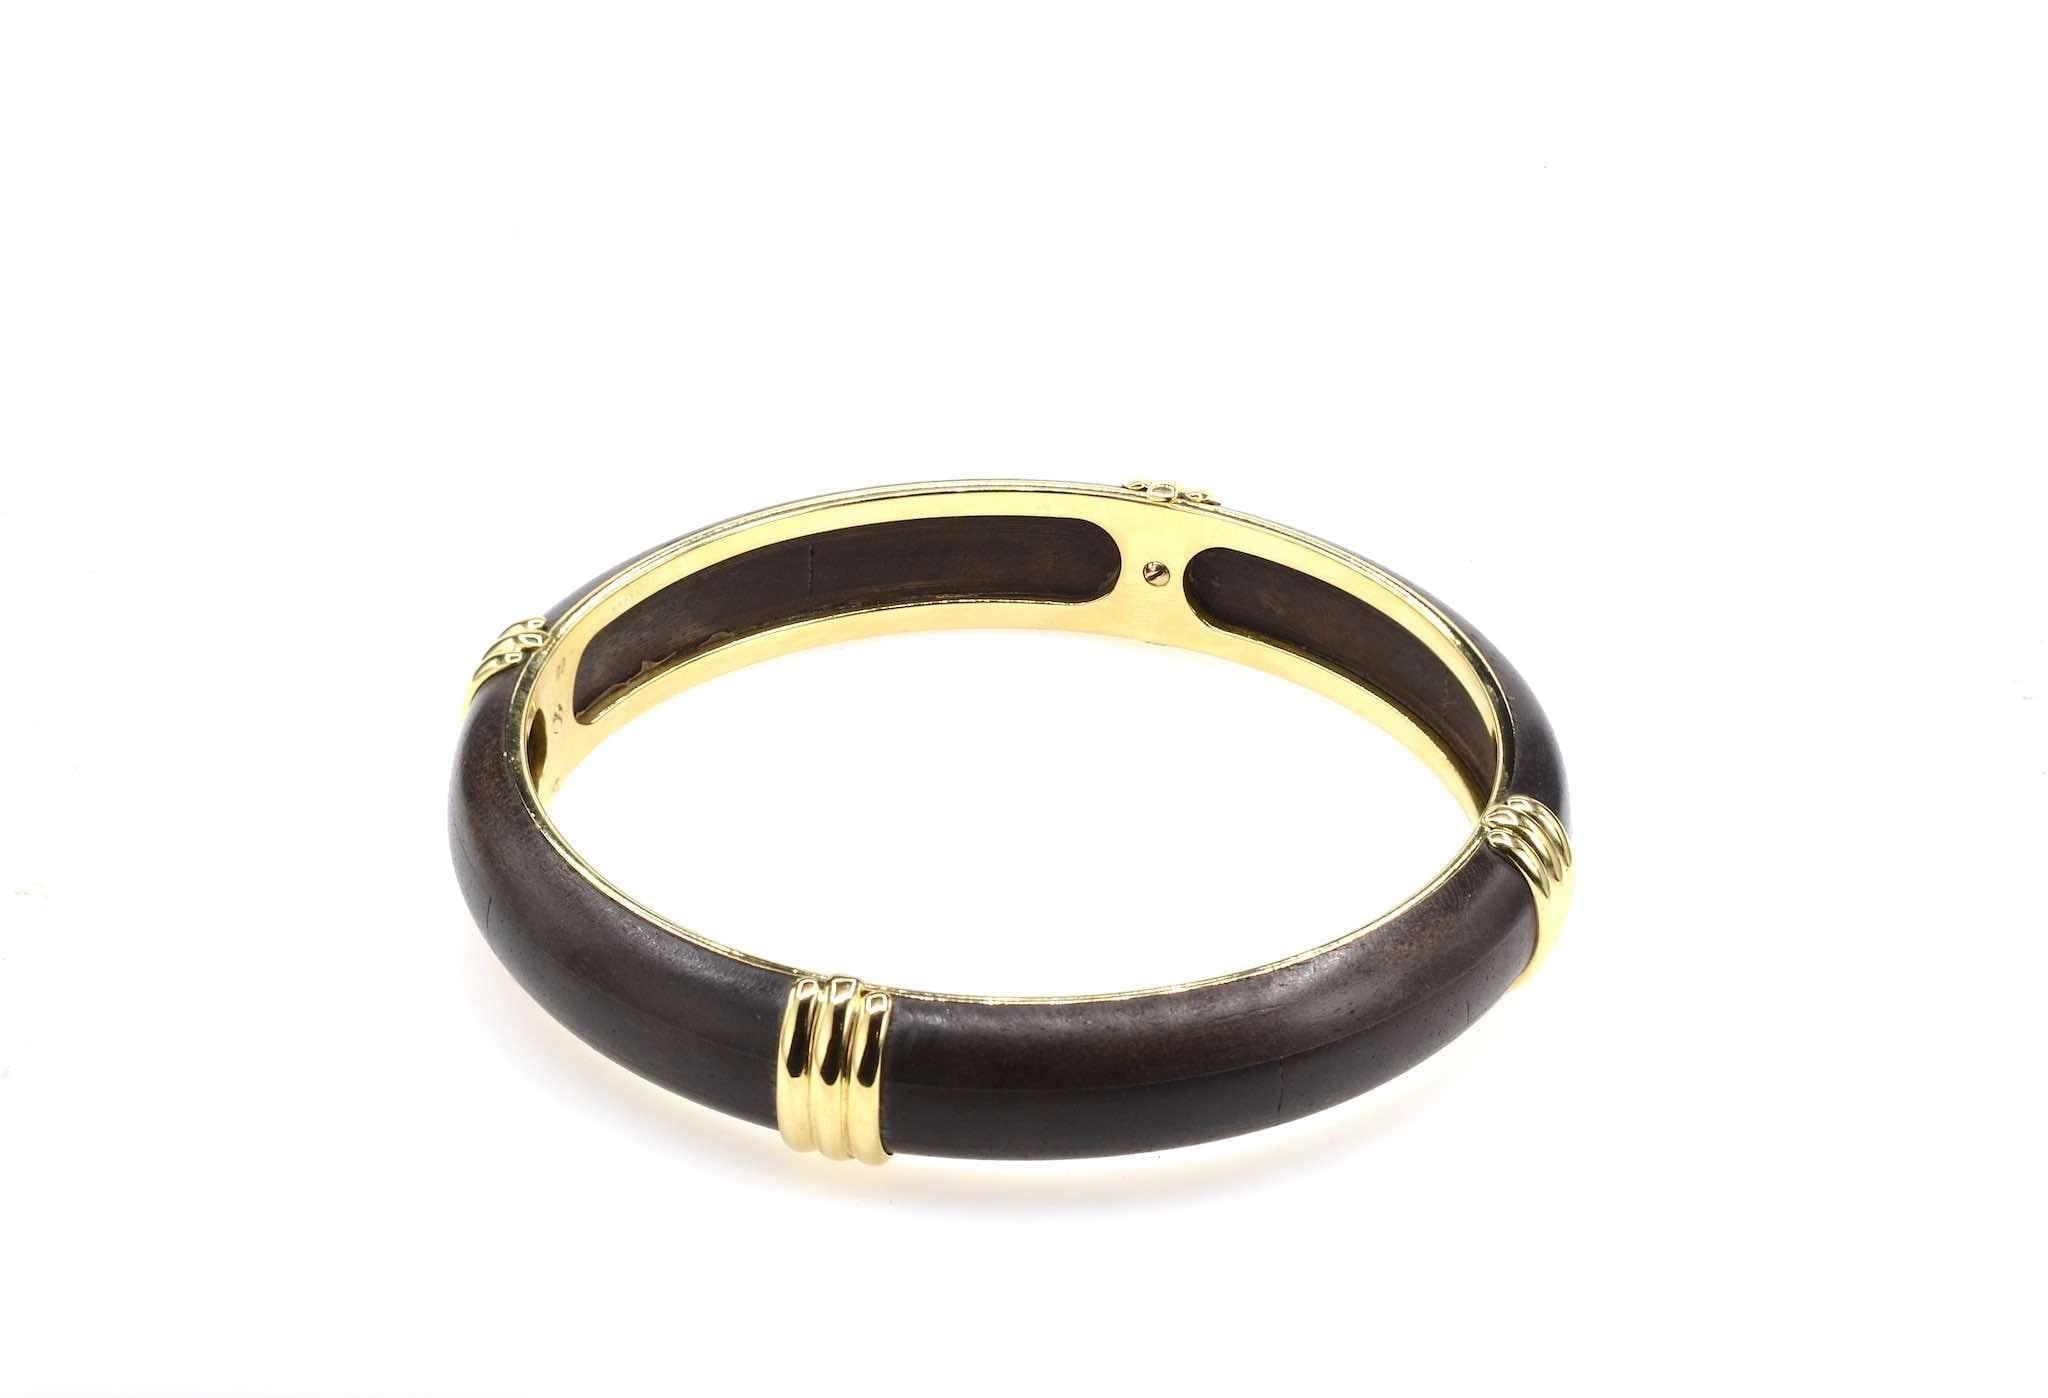 achat bracelet ancien or 18k et bois